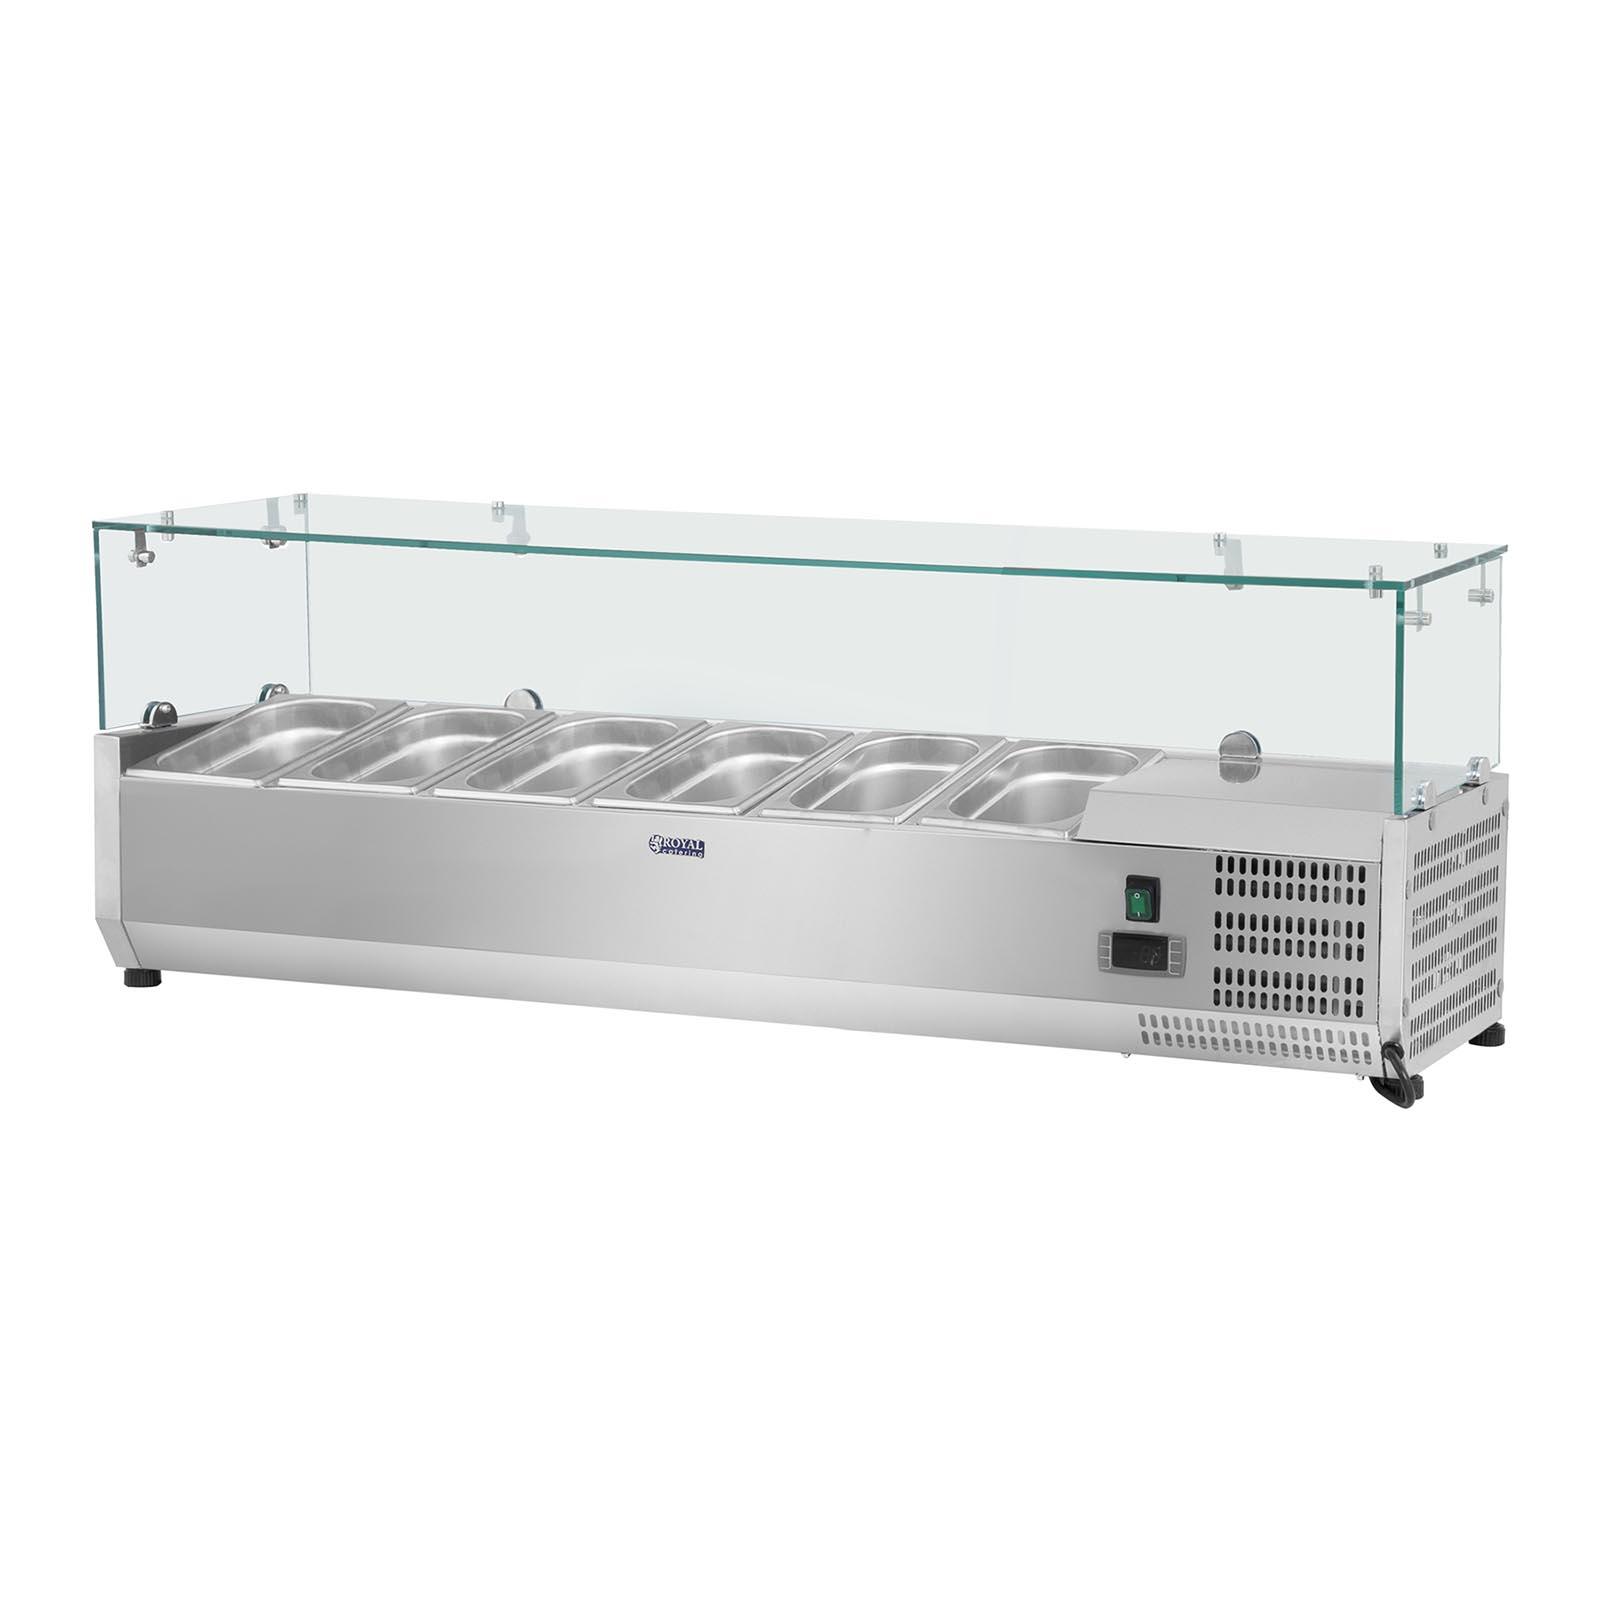 Chladiaca nadstavba - 140 x 33 cm - 6 GN nádob 14 - sklenený zákryt - 1